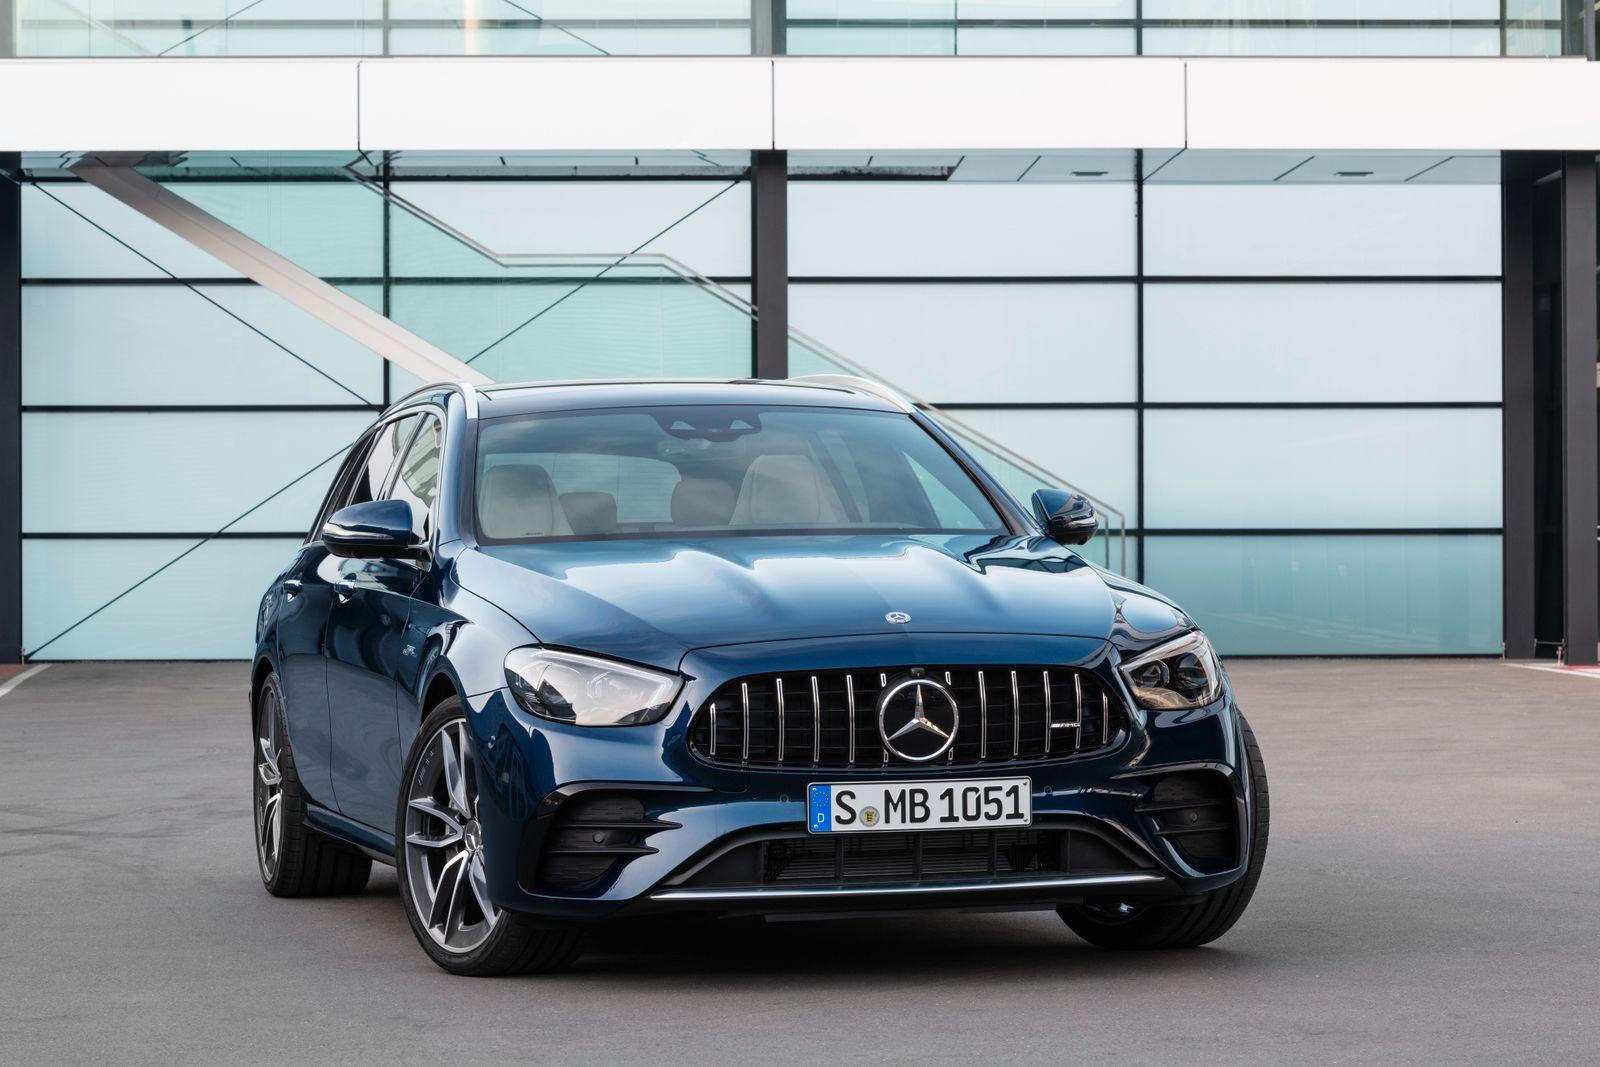 Mercedes-AMG E-Klasse (S213), 2020 Mercedes-AMG E-Klasse (S213), 2020